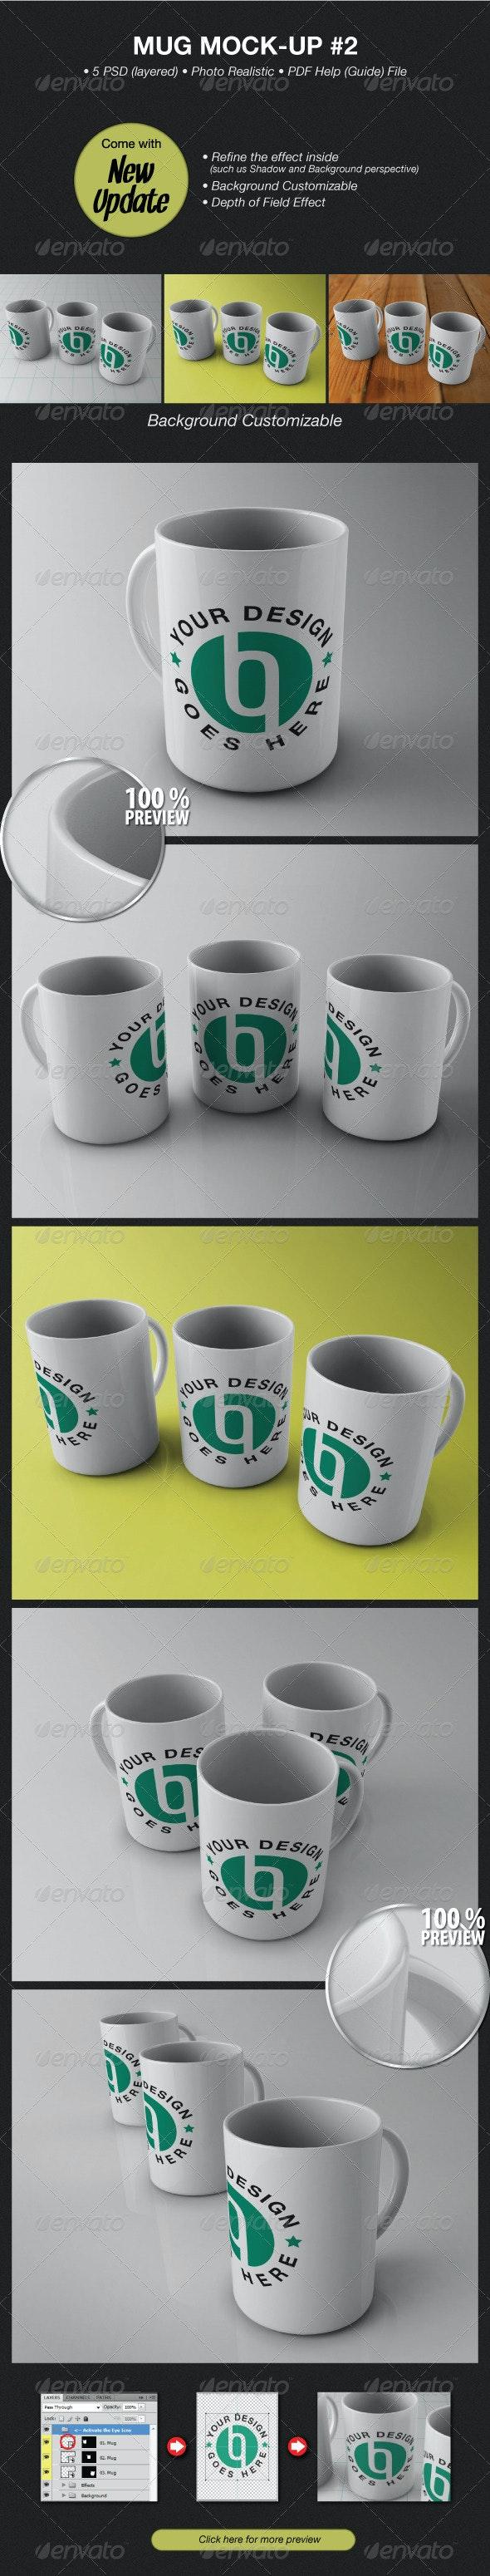 Mug Mockup #2 - Food and Drink Packaging